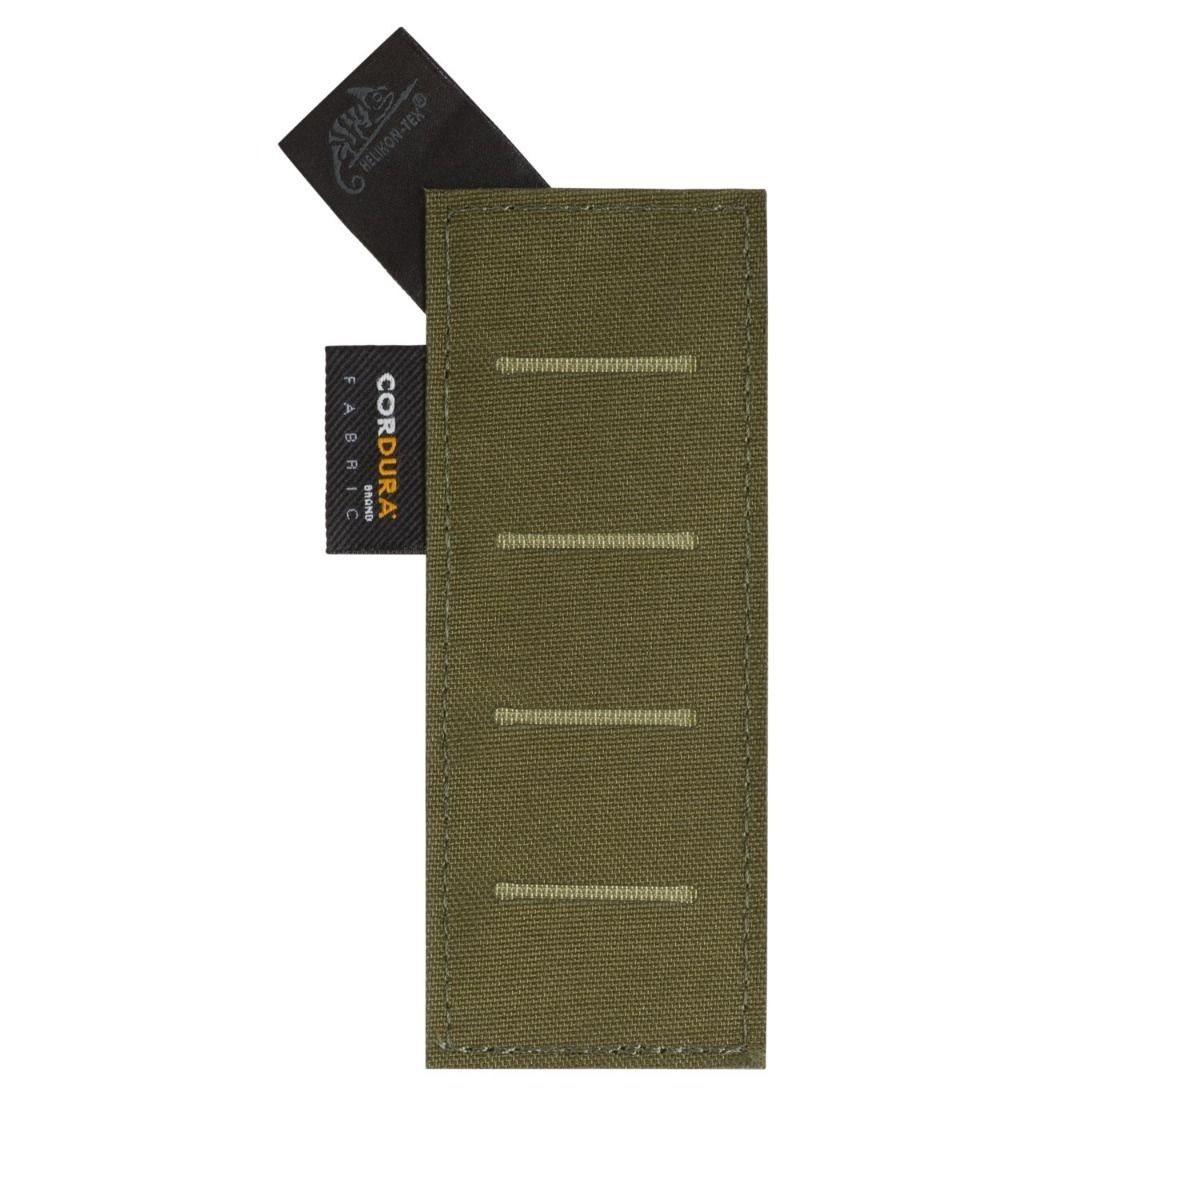 Panel MOLLE INSERT 1® Cordura® OLIVE GREEN